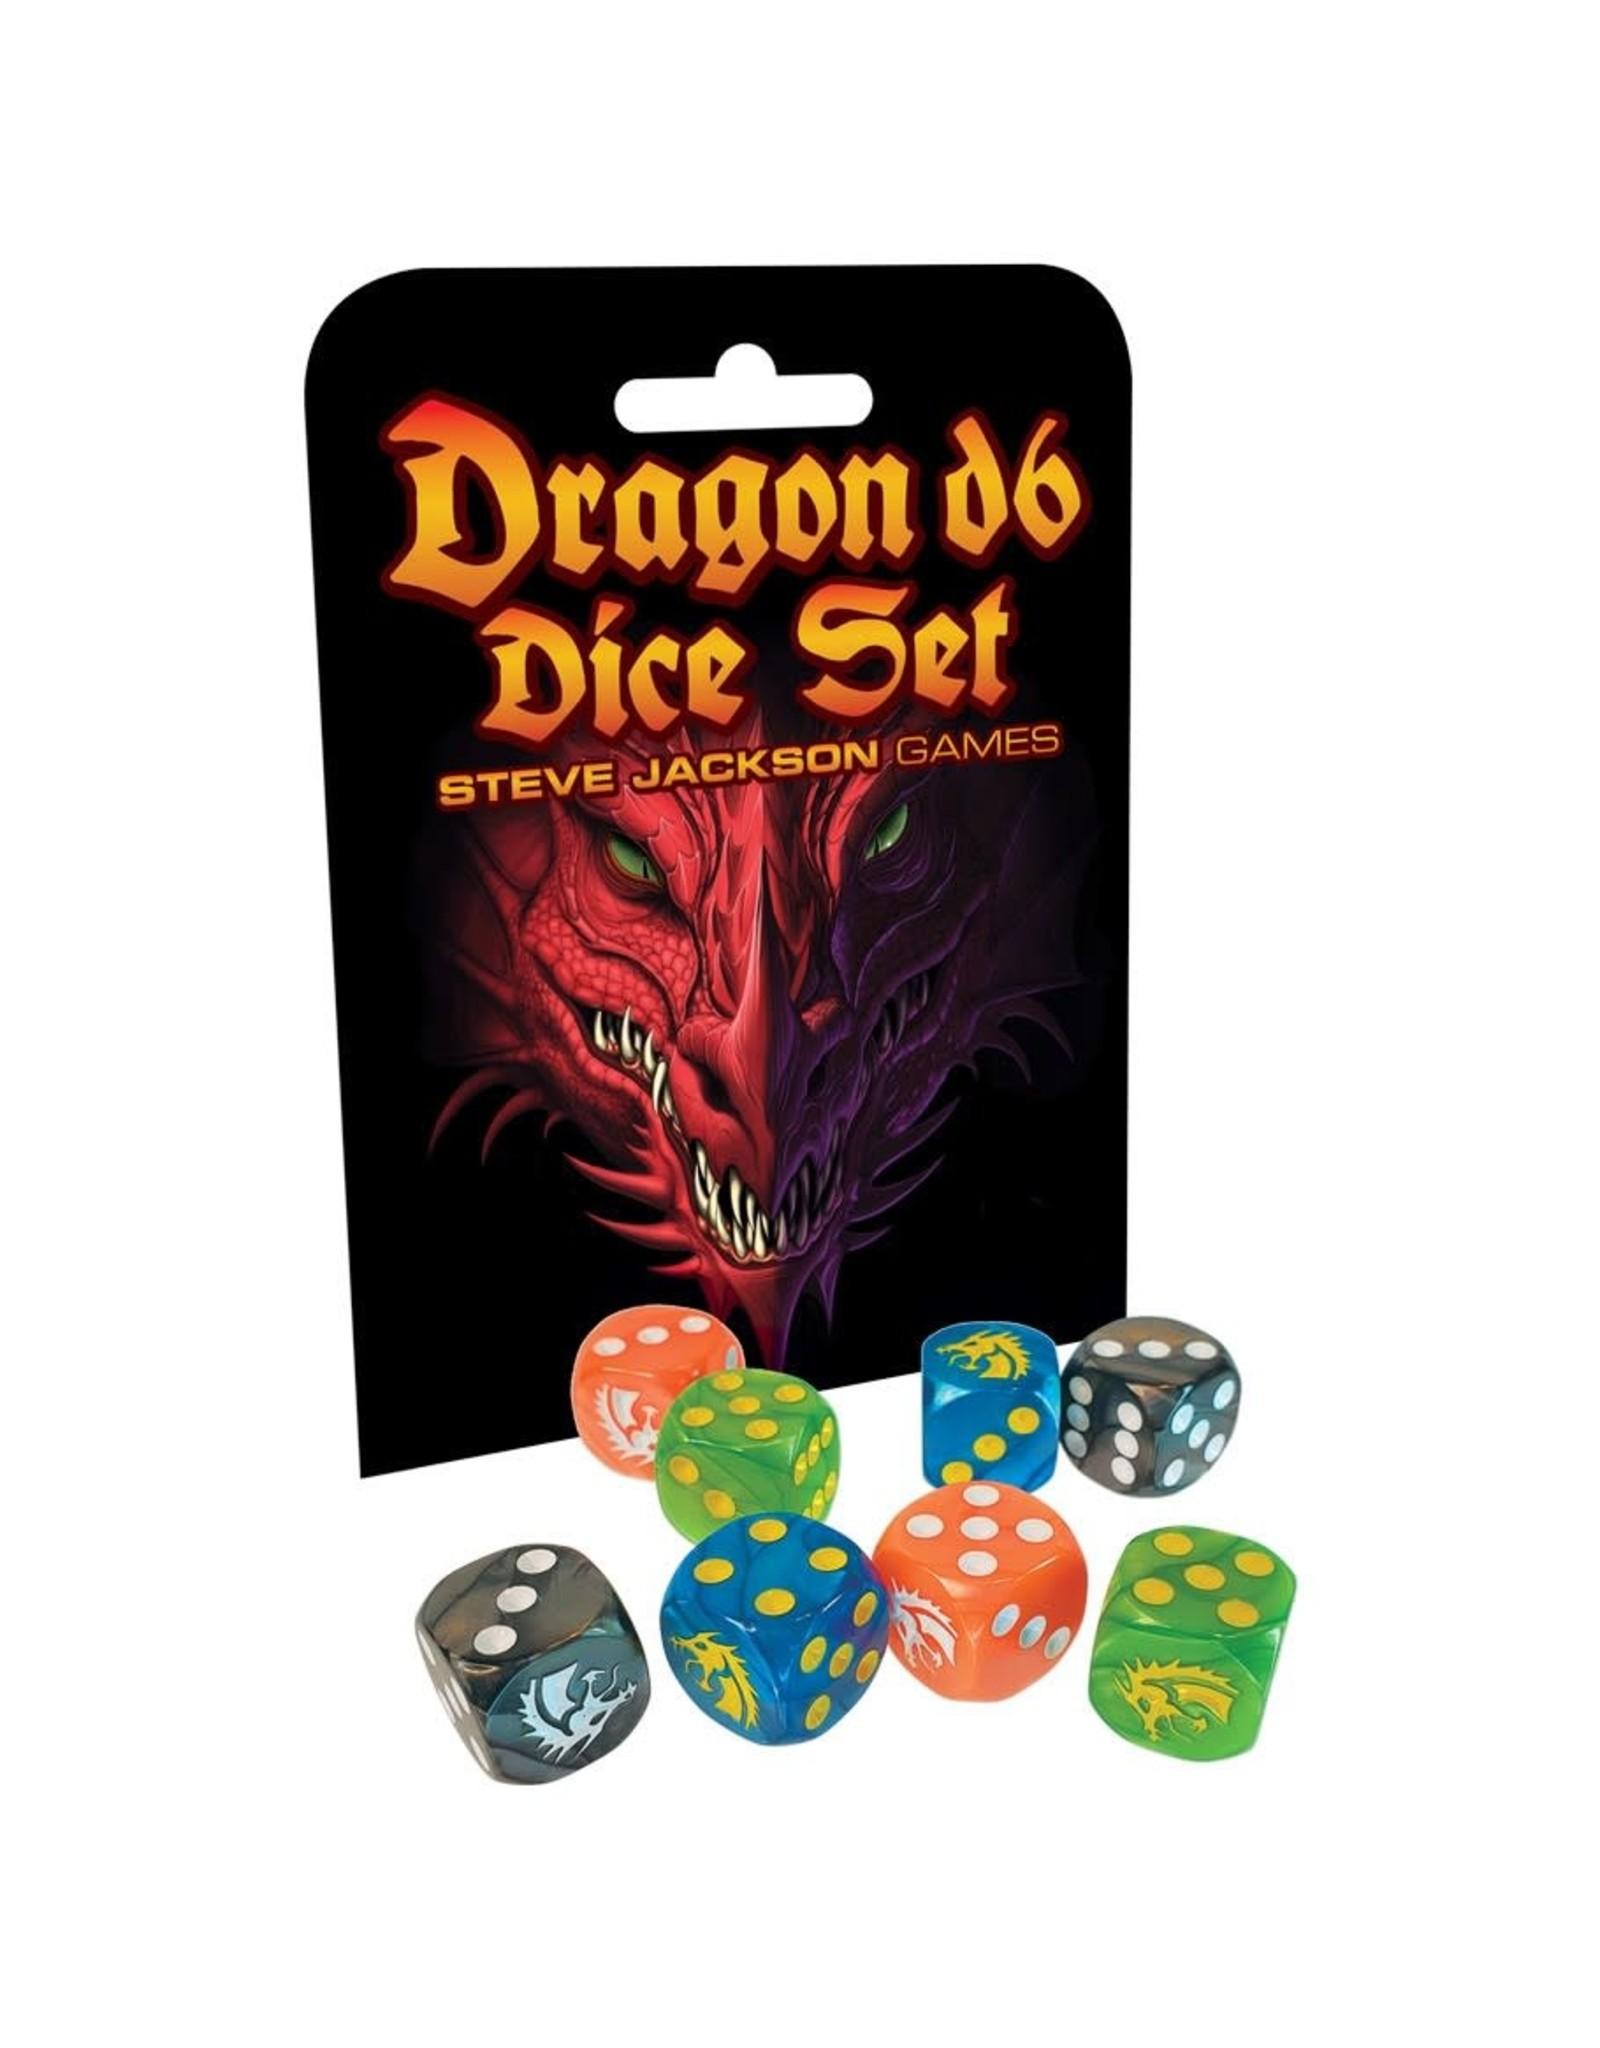 Steve Jackson Games Dragon d6 Dice set